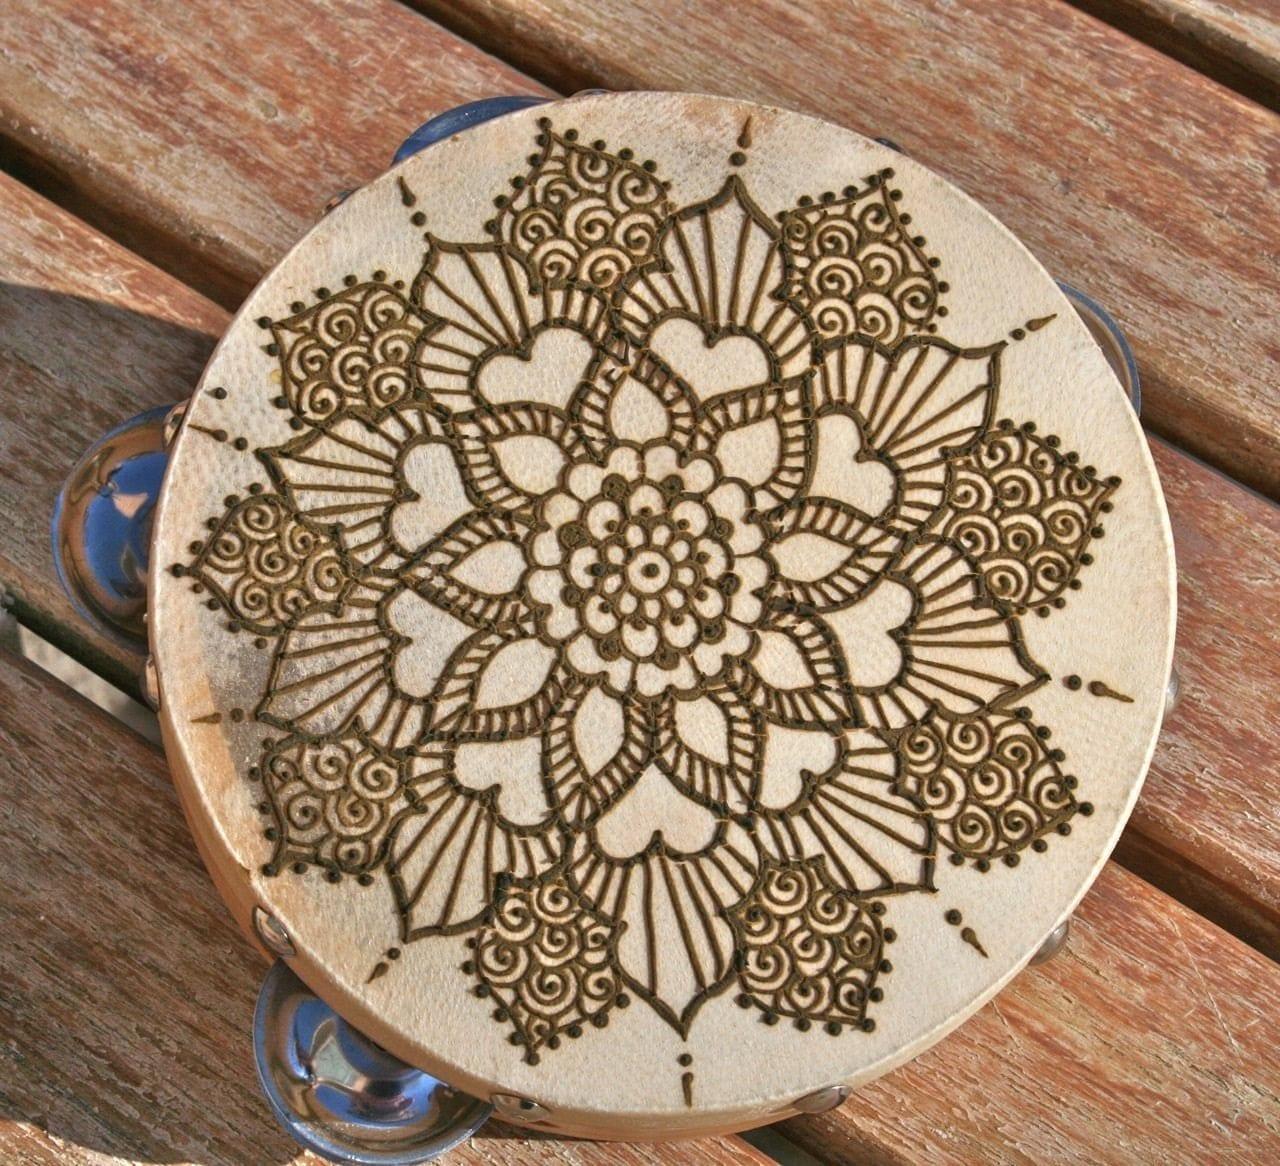 Mehndi Mandala Designs : Henna mandala tambourine by redwoodhenna on etsy